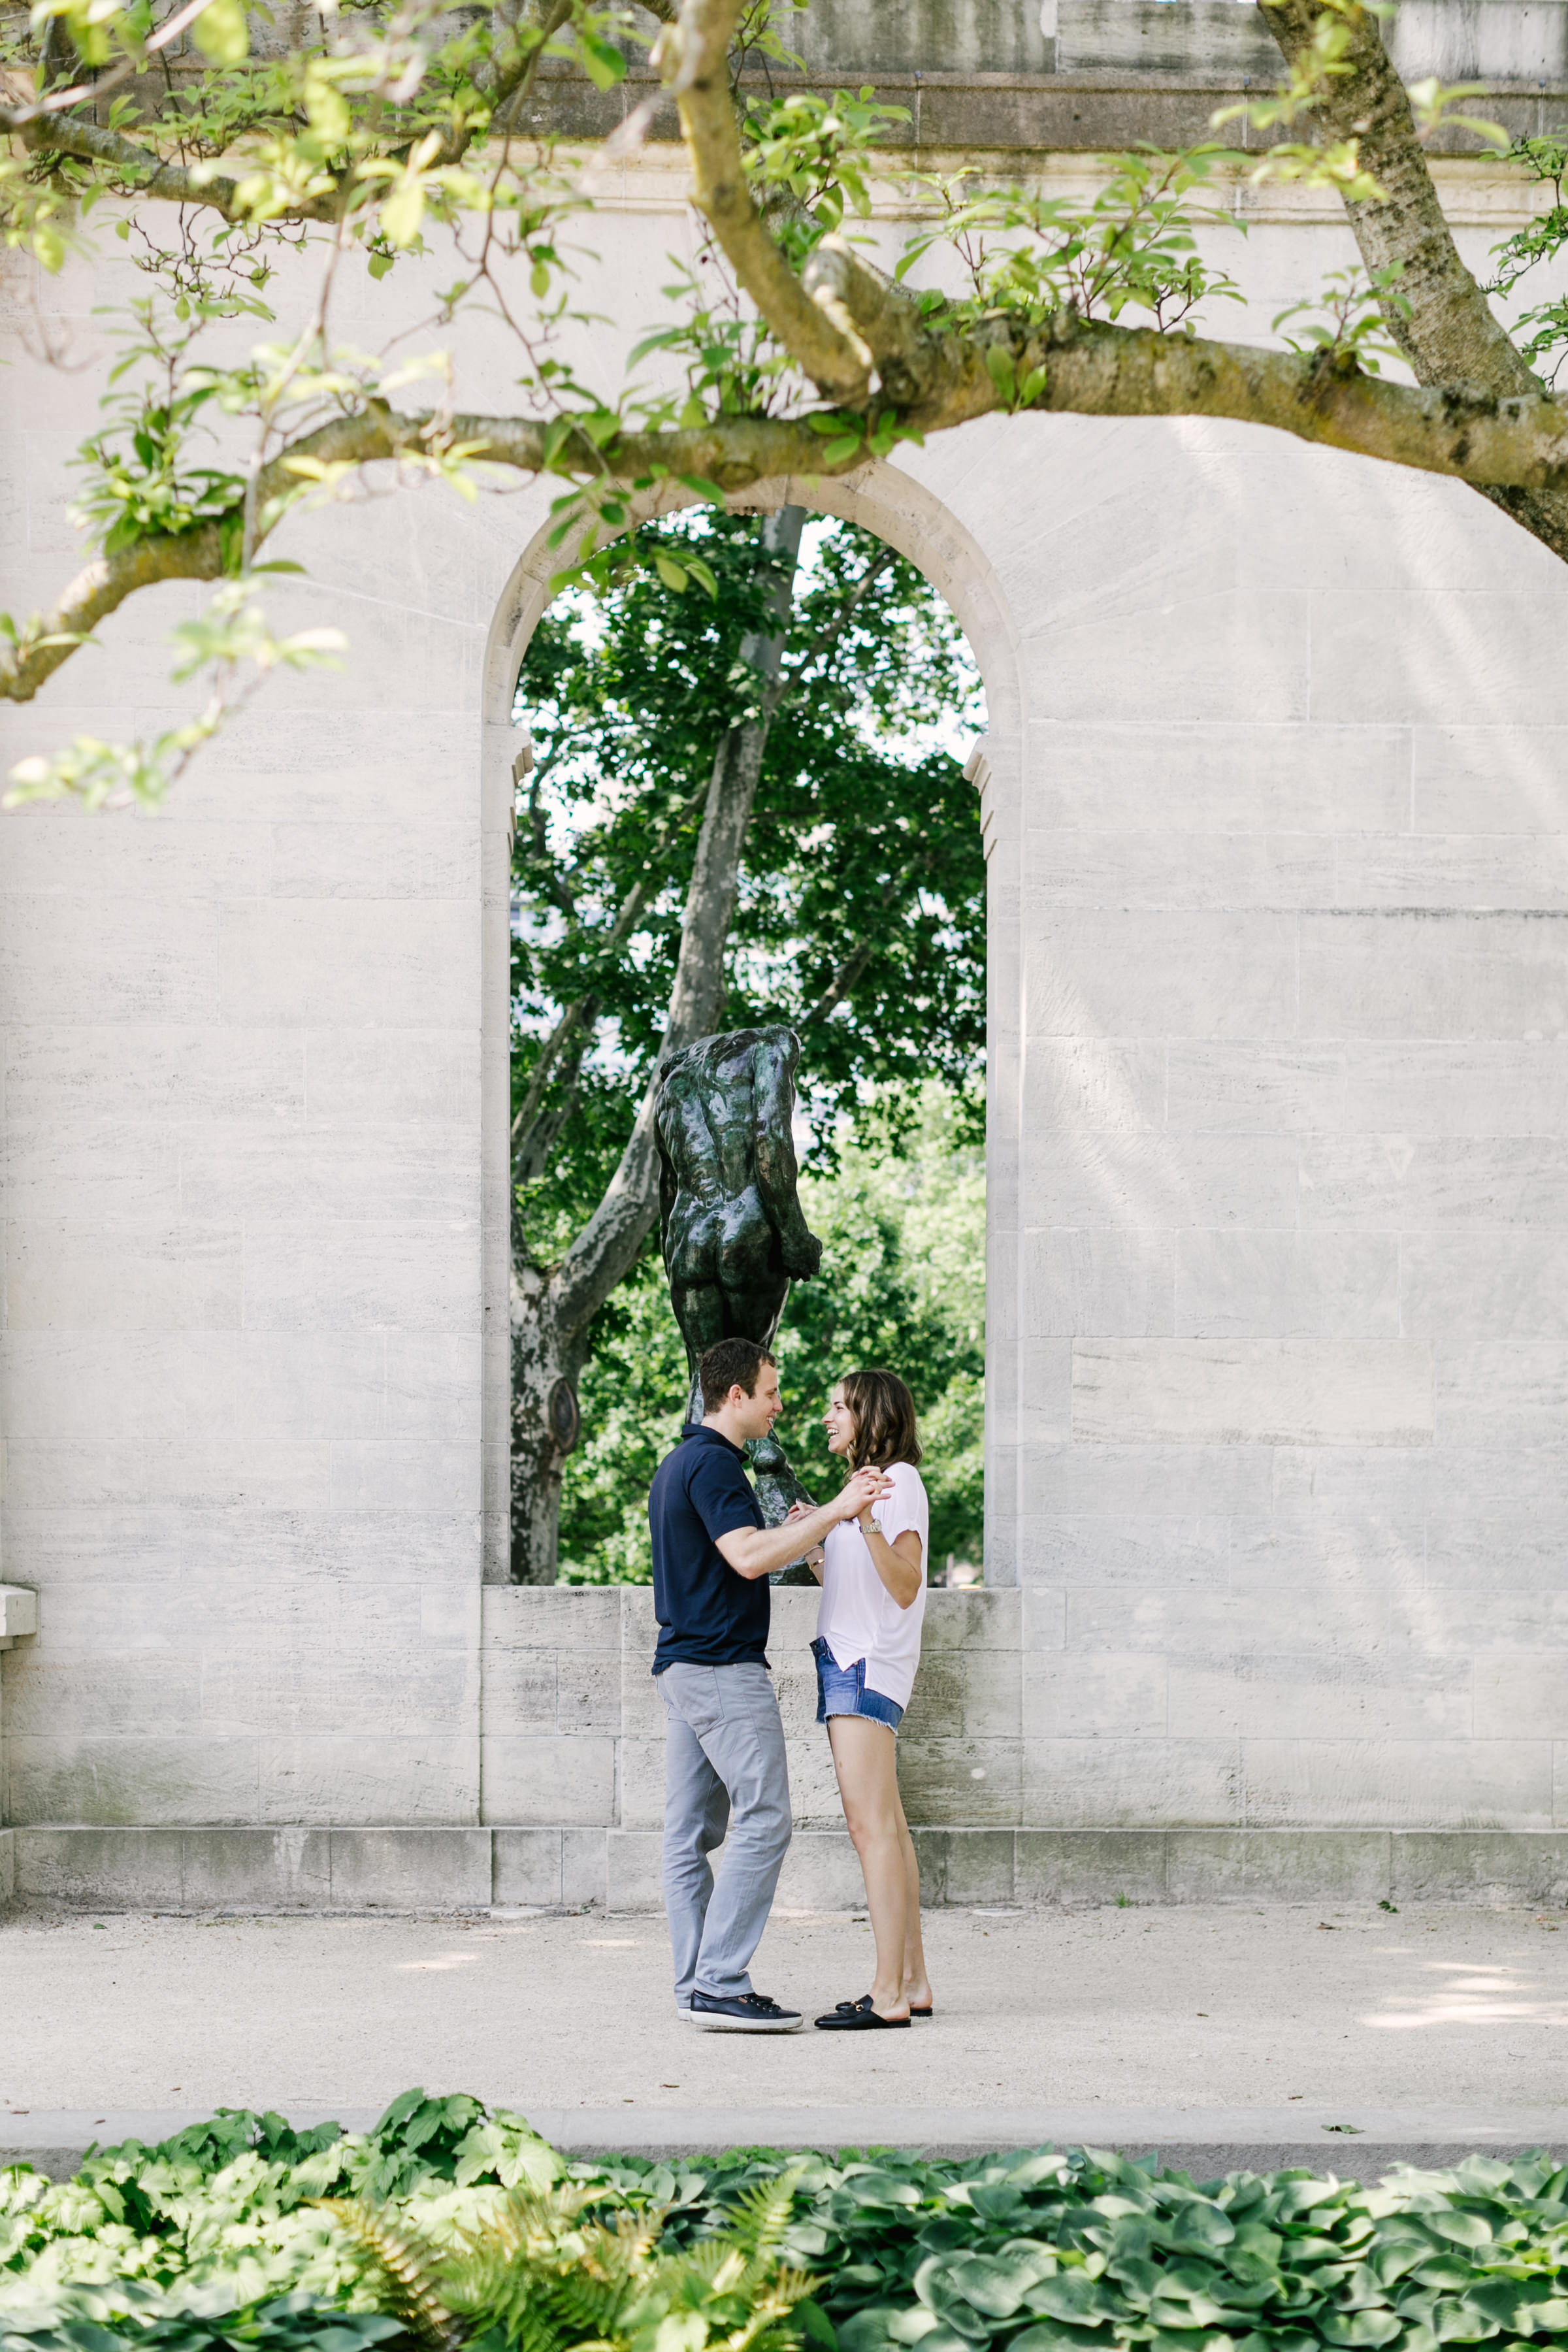 photography-natural-candid-engaged-proposal-philadelphia-wedding-rodin museum-barnes foundation-parkway-modern-lifestyle-14.JPG